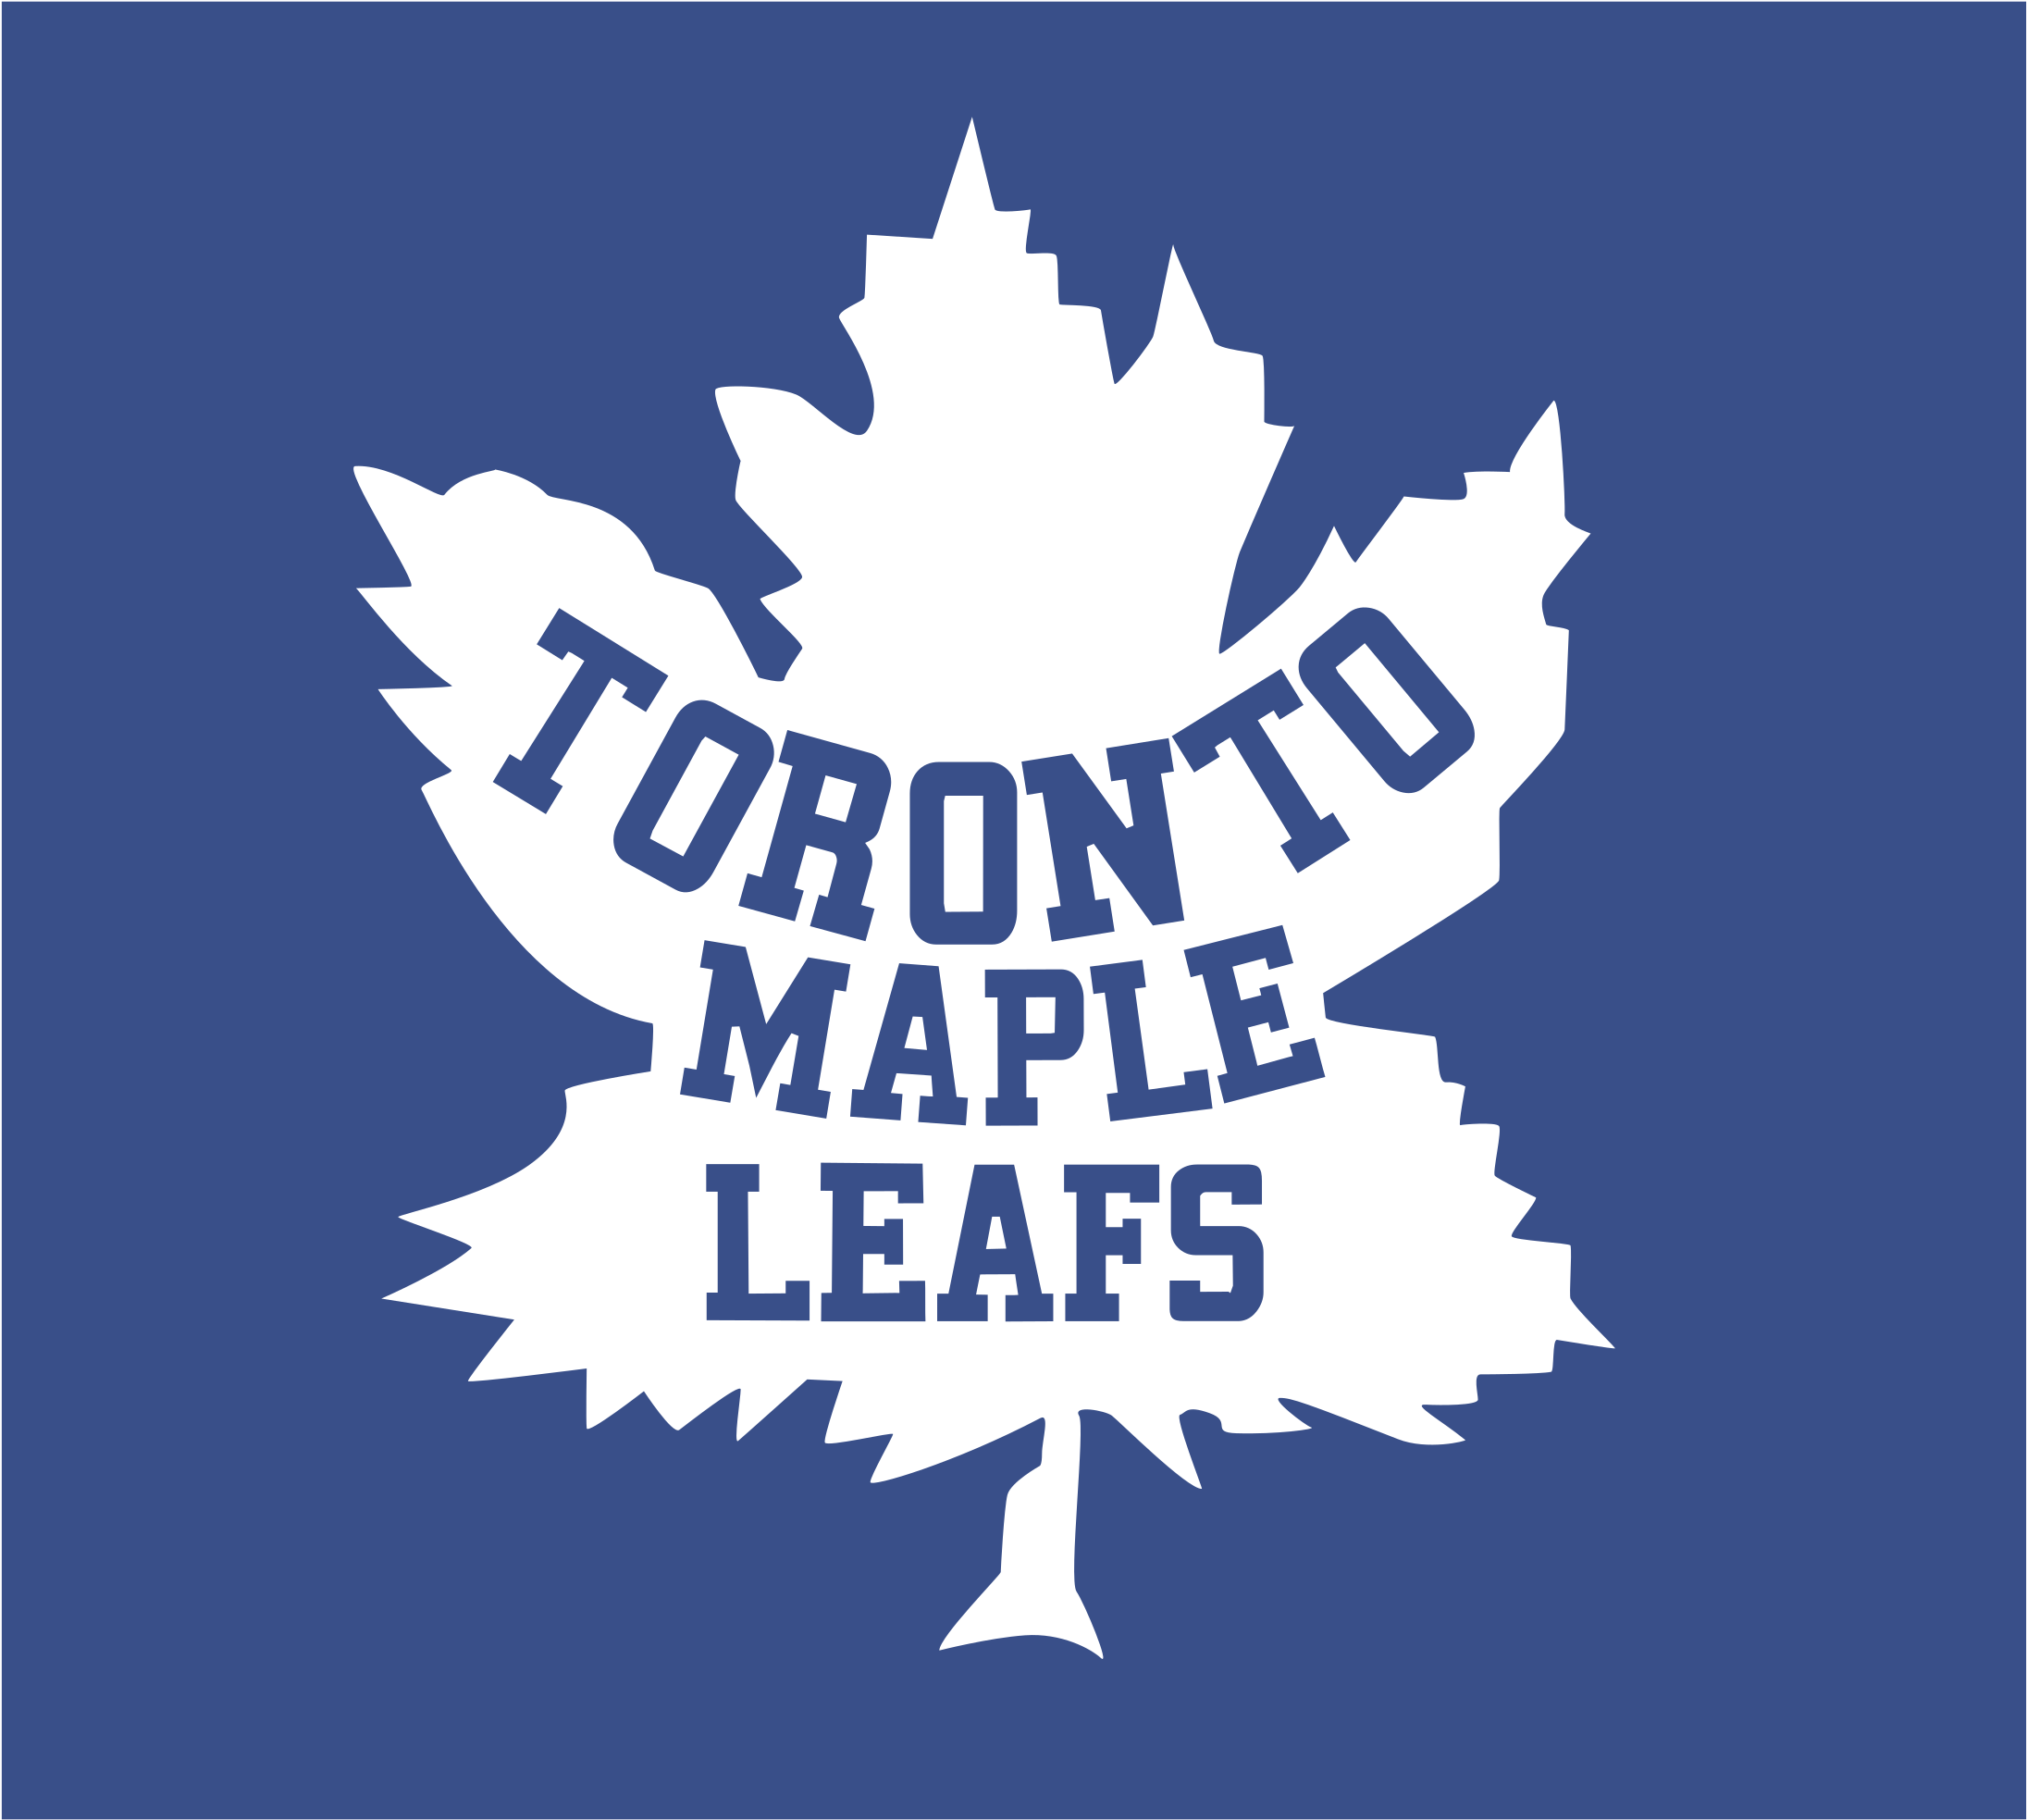 Toronto Maple Leafs Logo Png Transparent Toronto Maple Leafs Transparent Cartoon Jing Fm